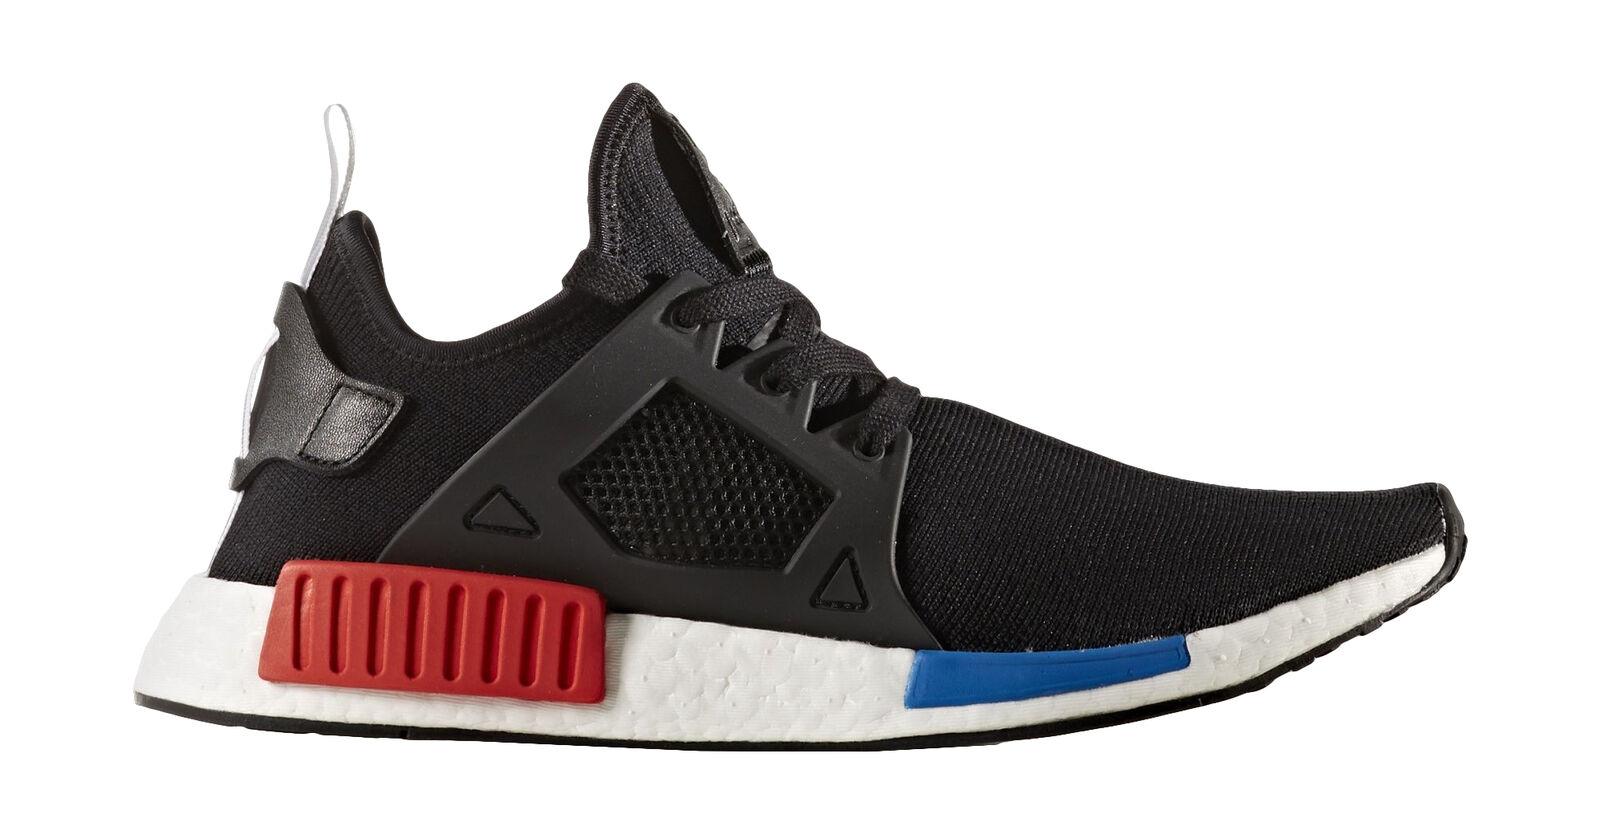 Adidas primeknit nmd_xr1 primeknit Adidas hombre zapatos - confortable fc871e